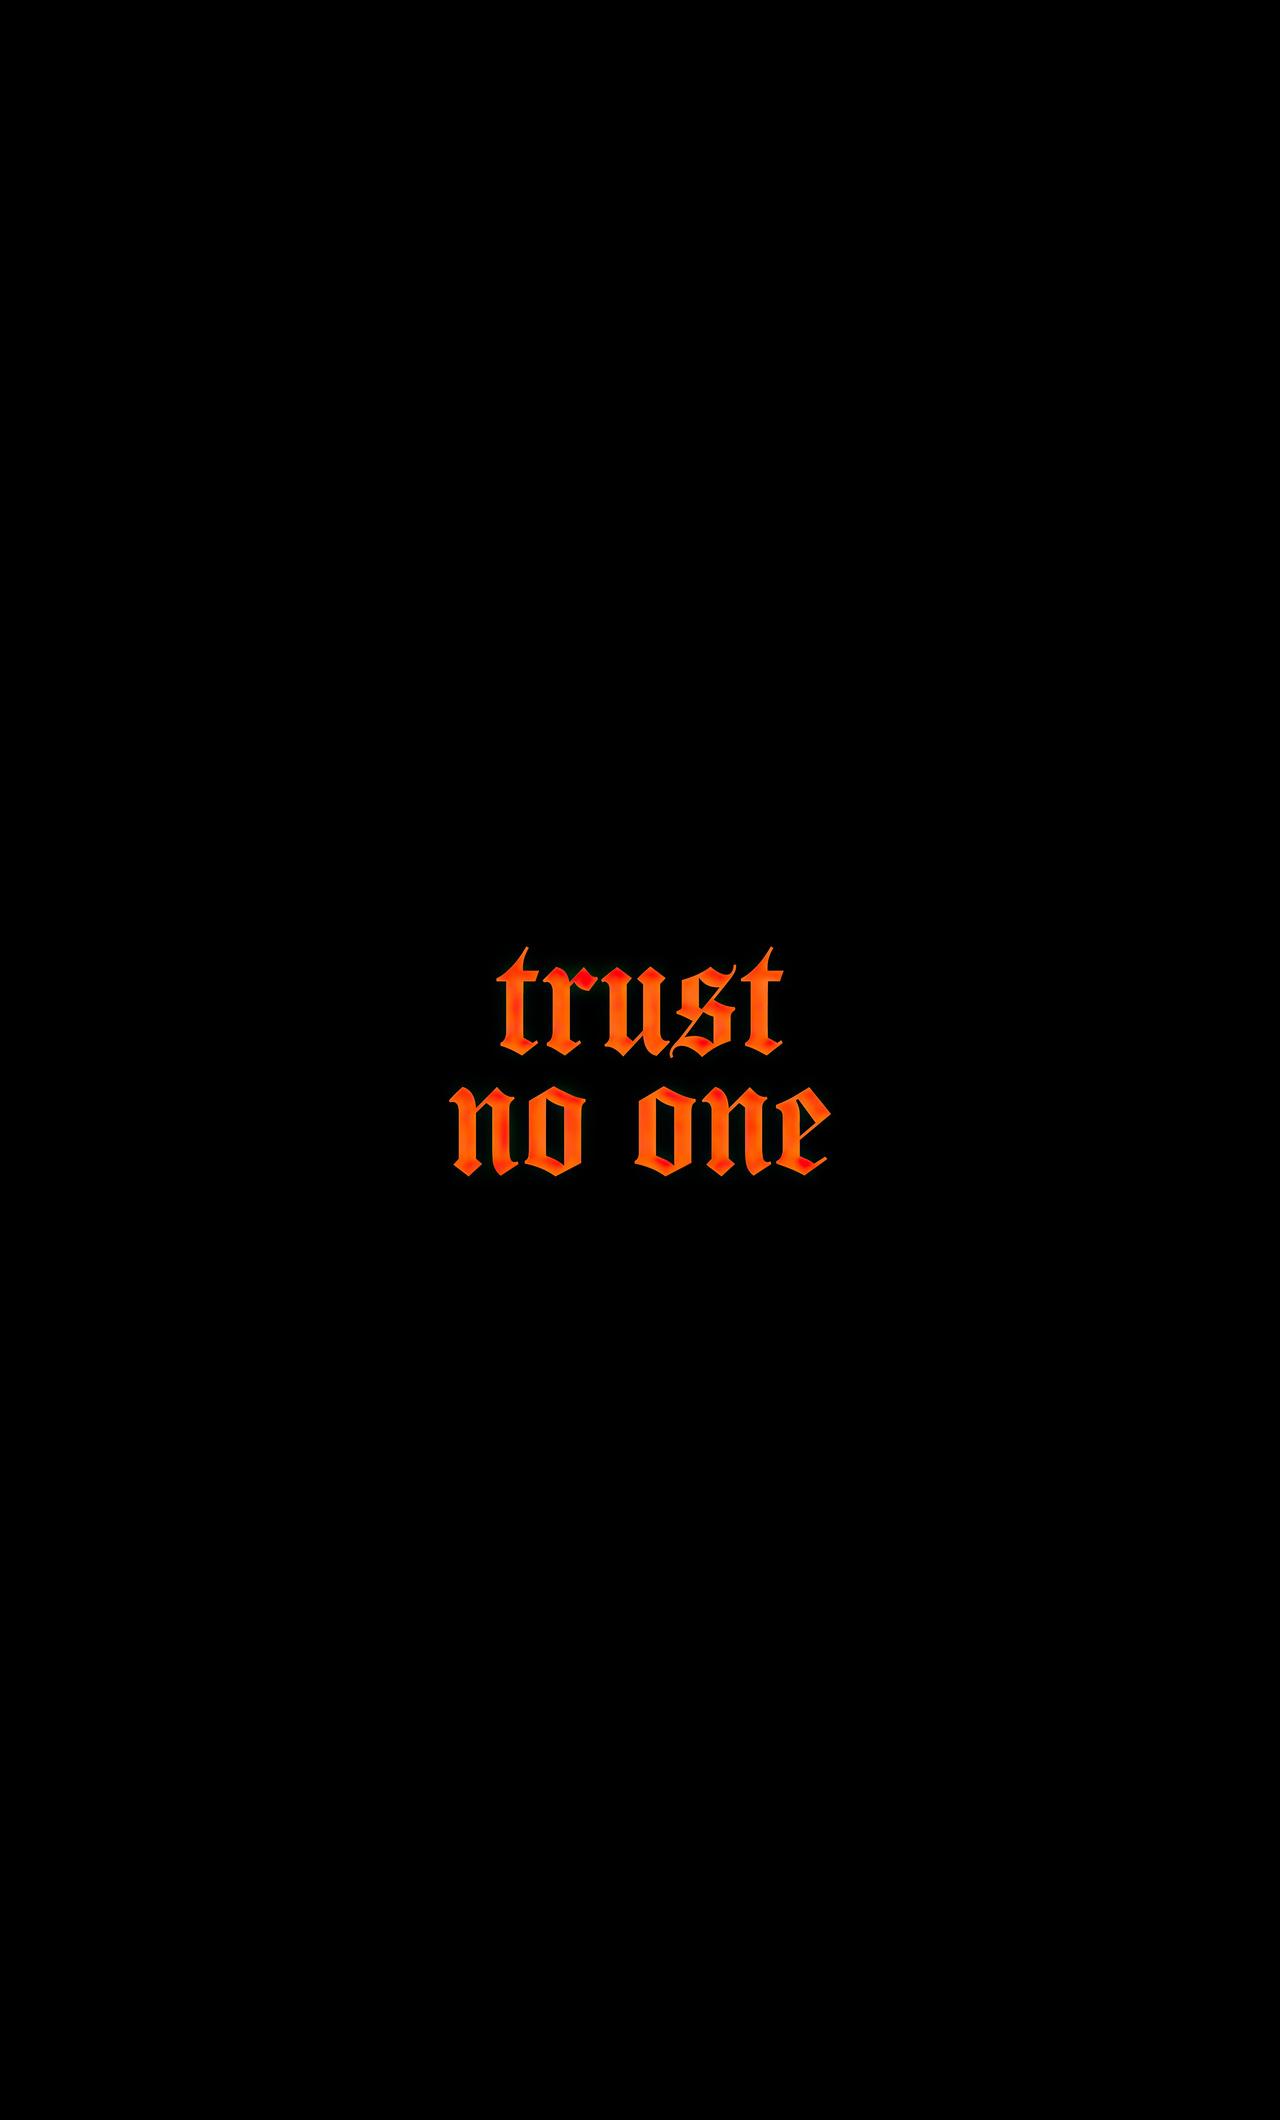 trust-no-one-uq.jpg